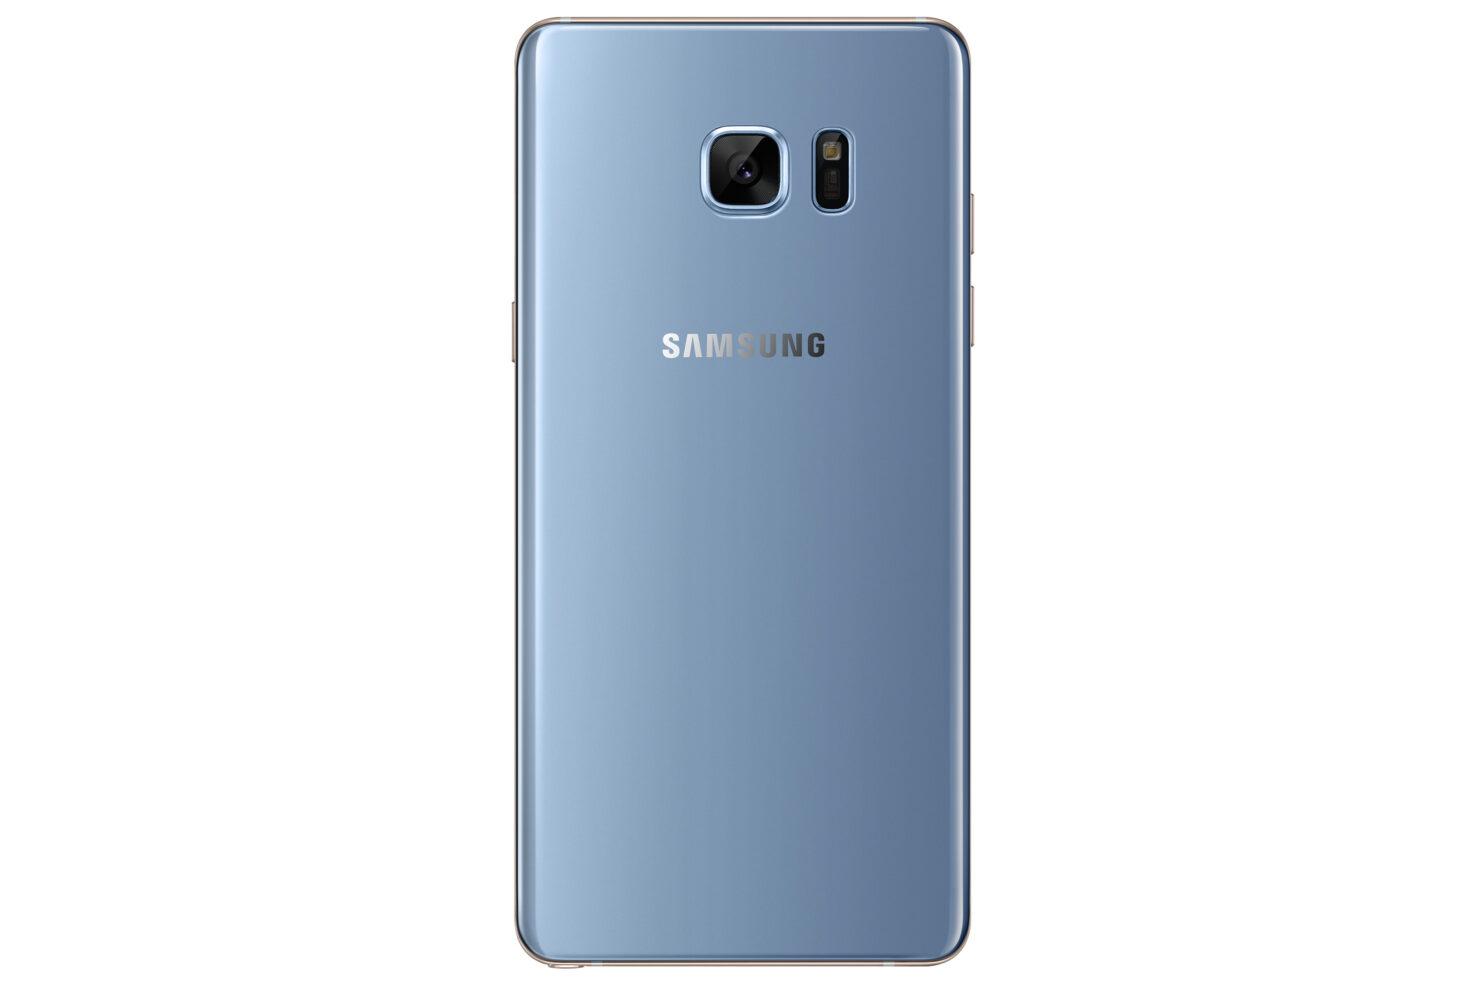 galaxy-note7_blue-coral_01_28614157432_o